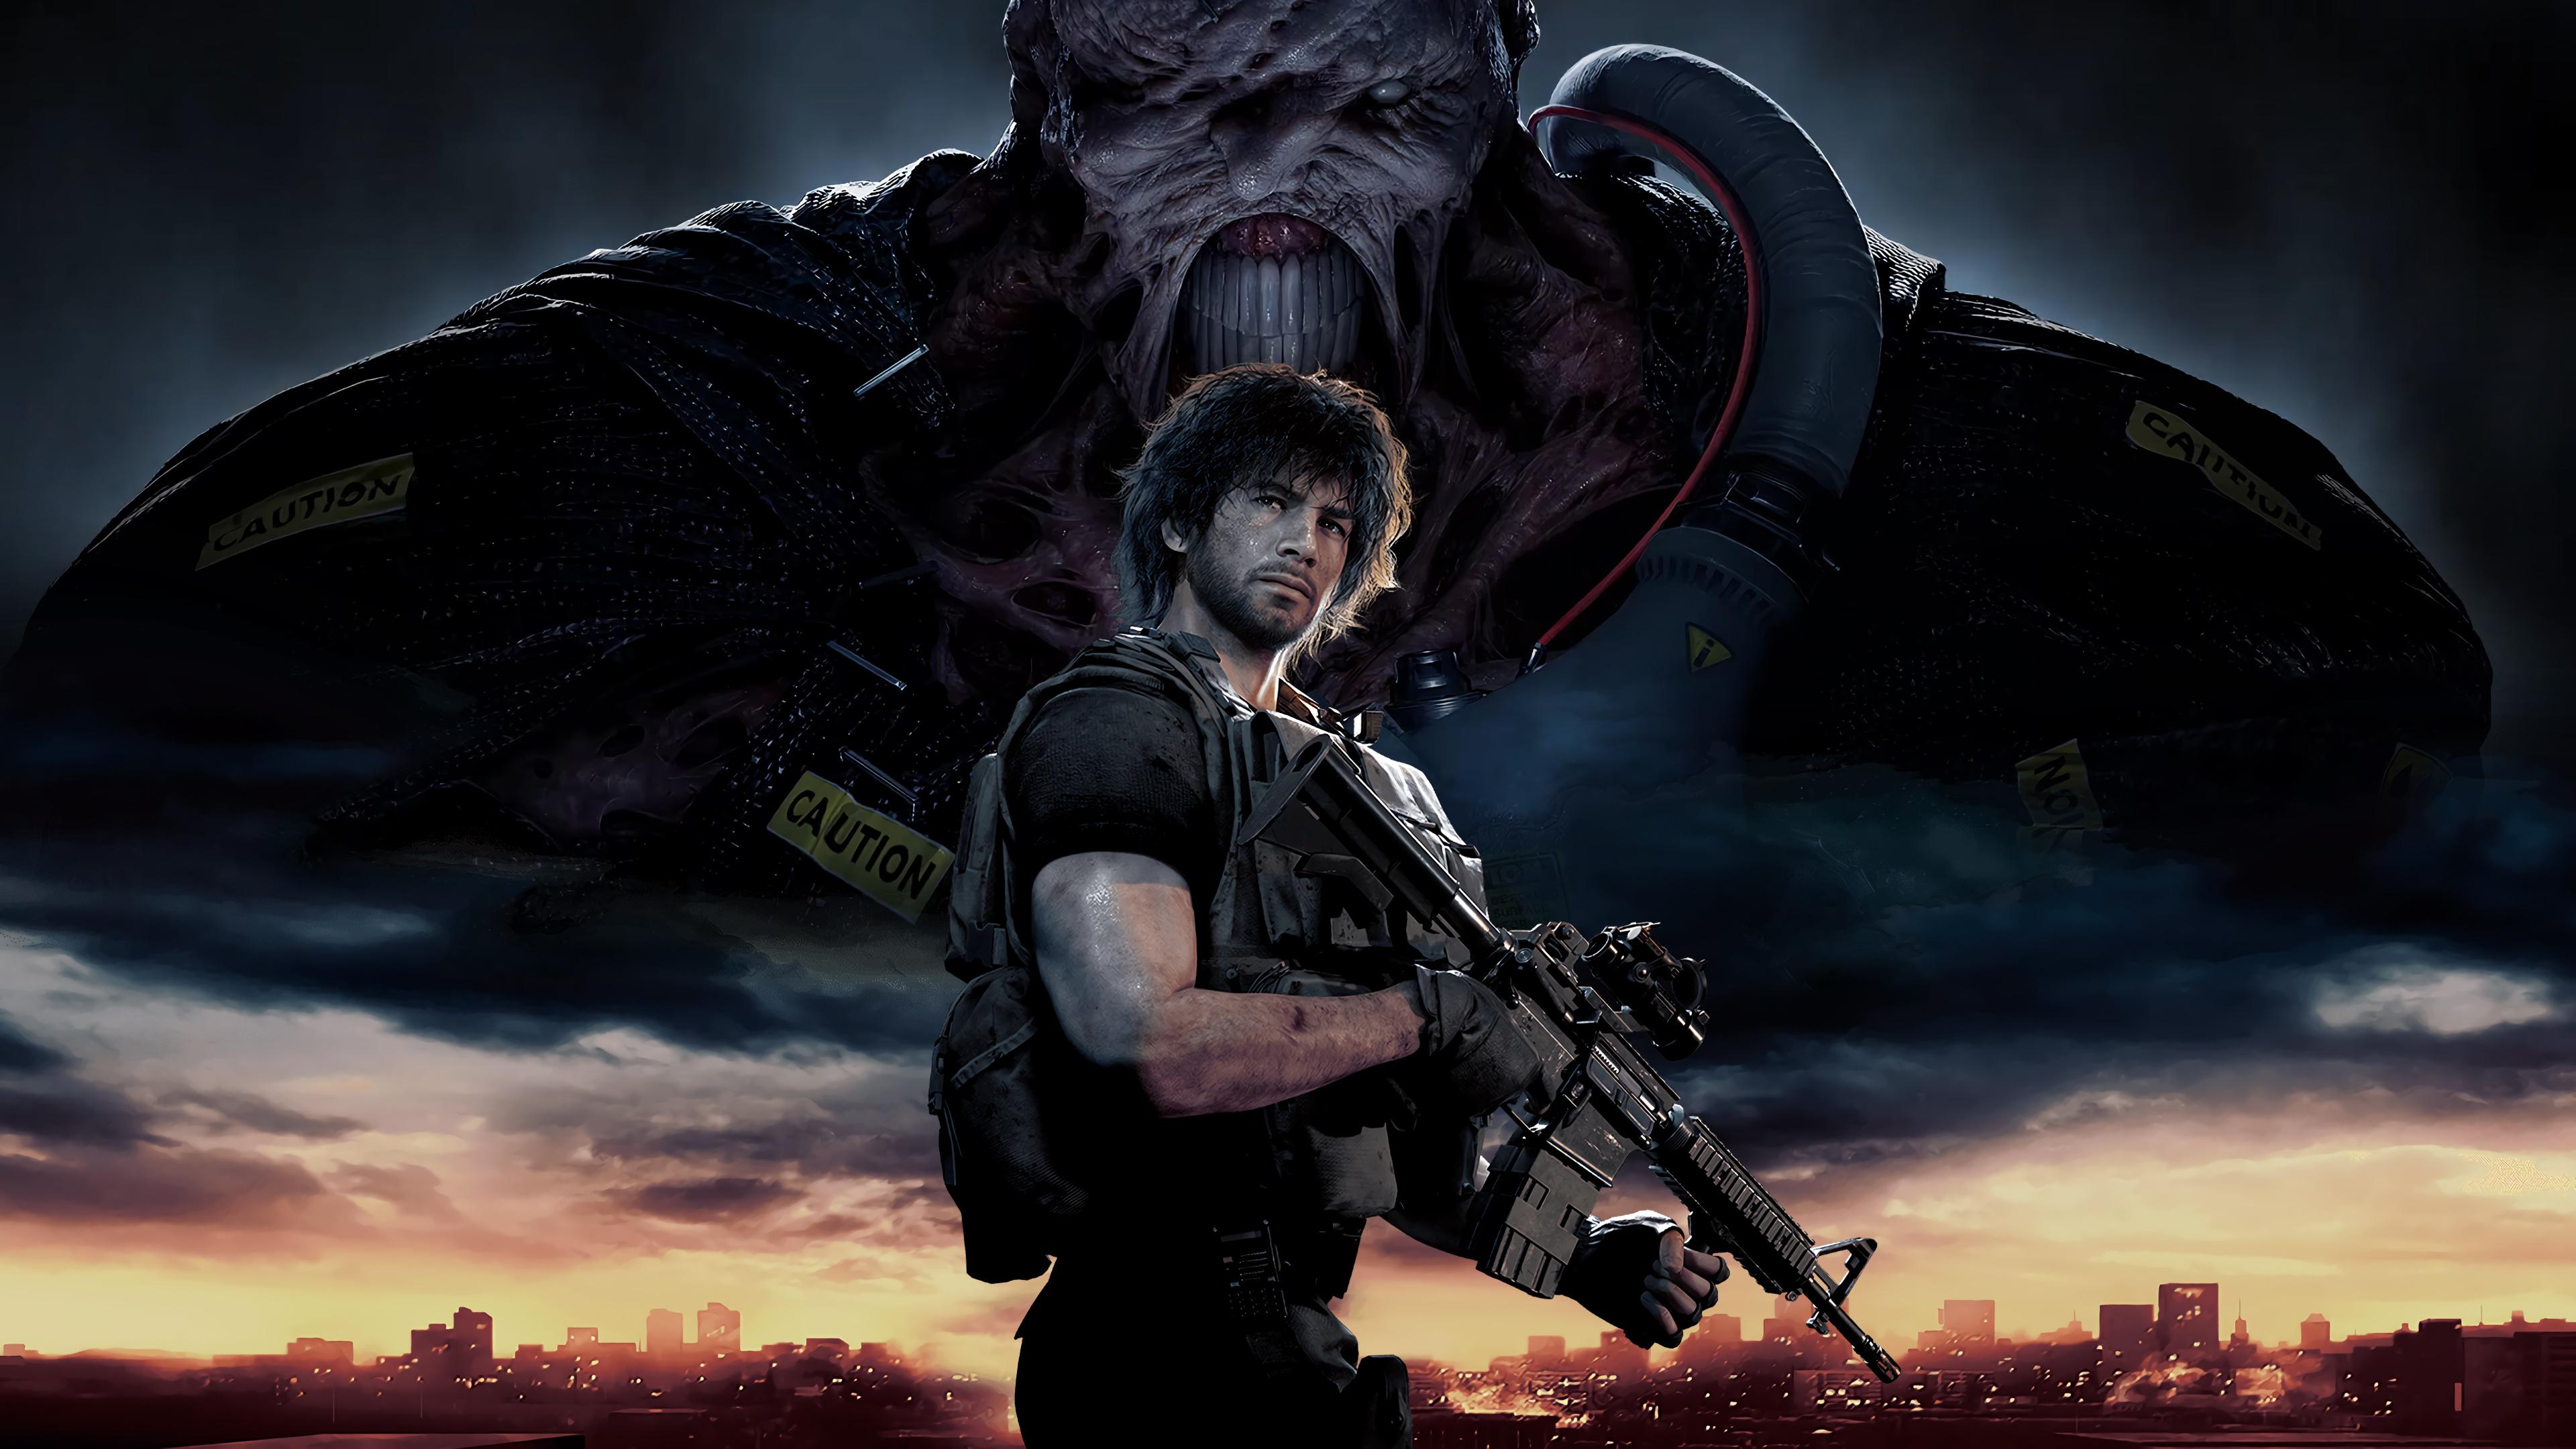 4k Resident Evil 3 Remake Wallpaper Hd Games 4k Wallpapers